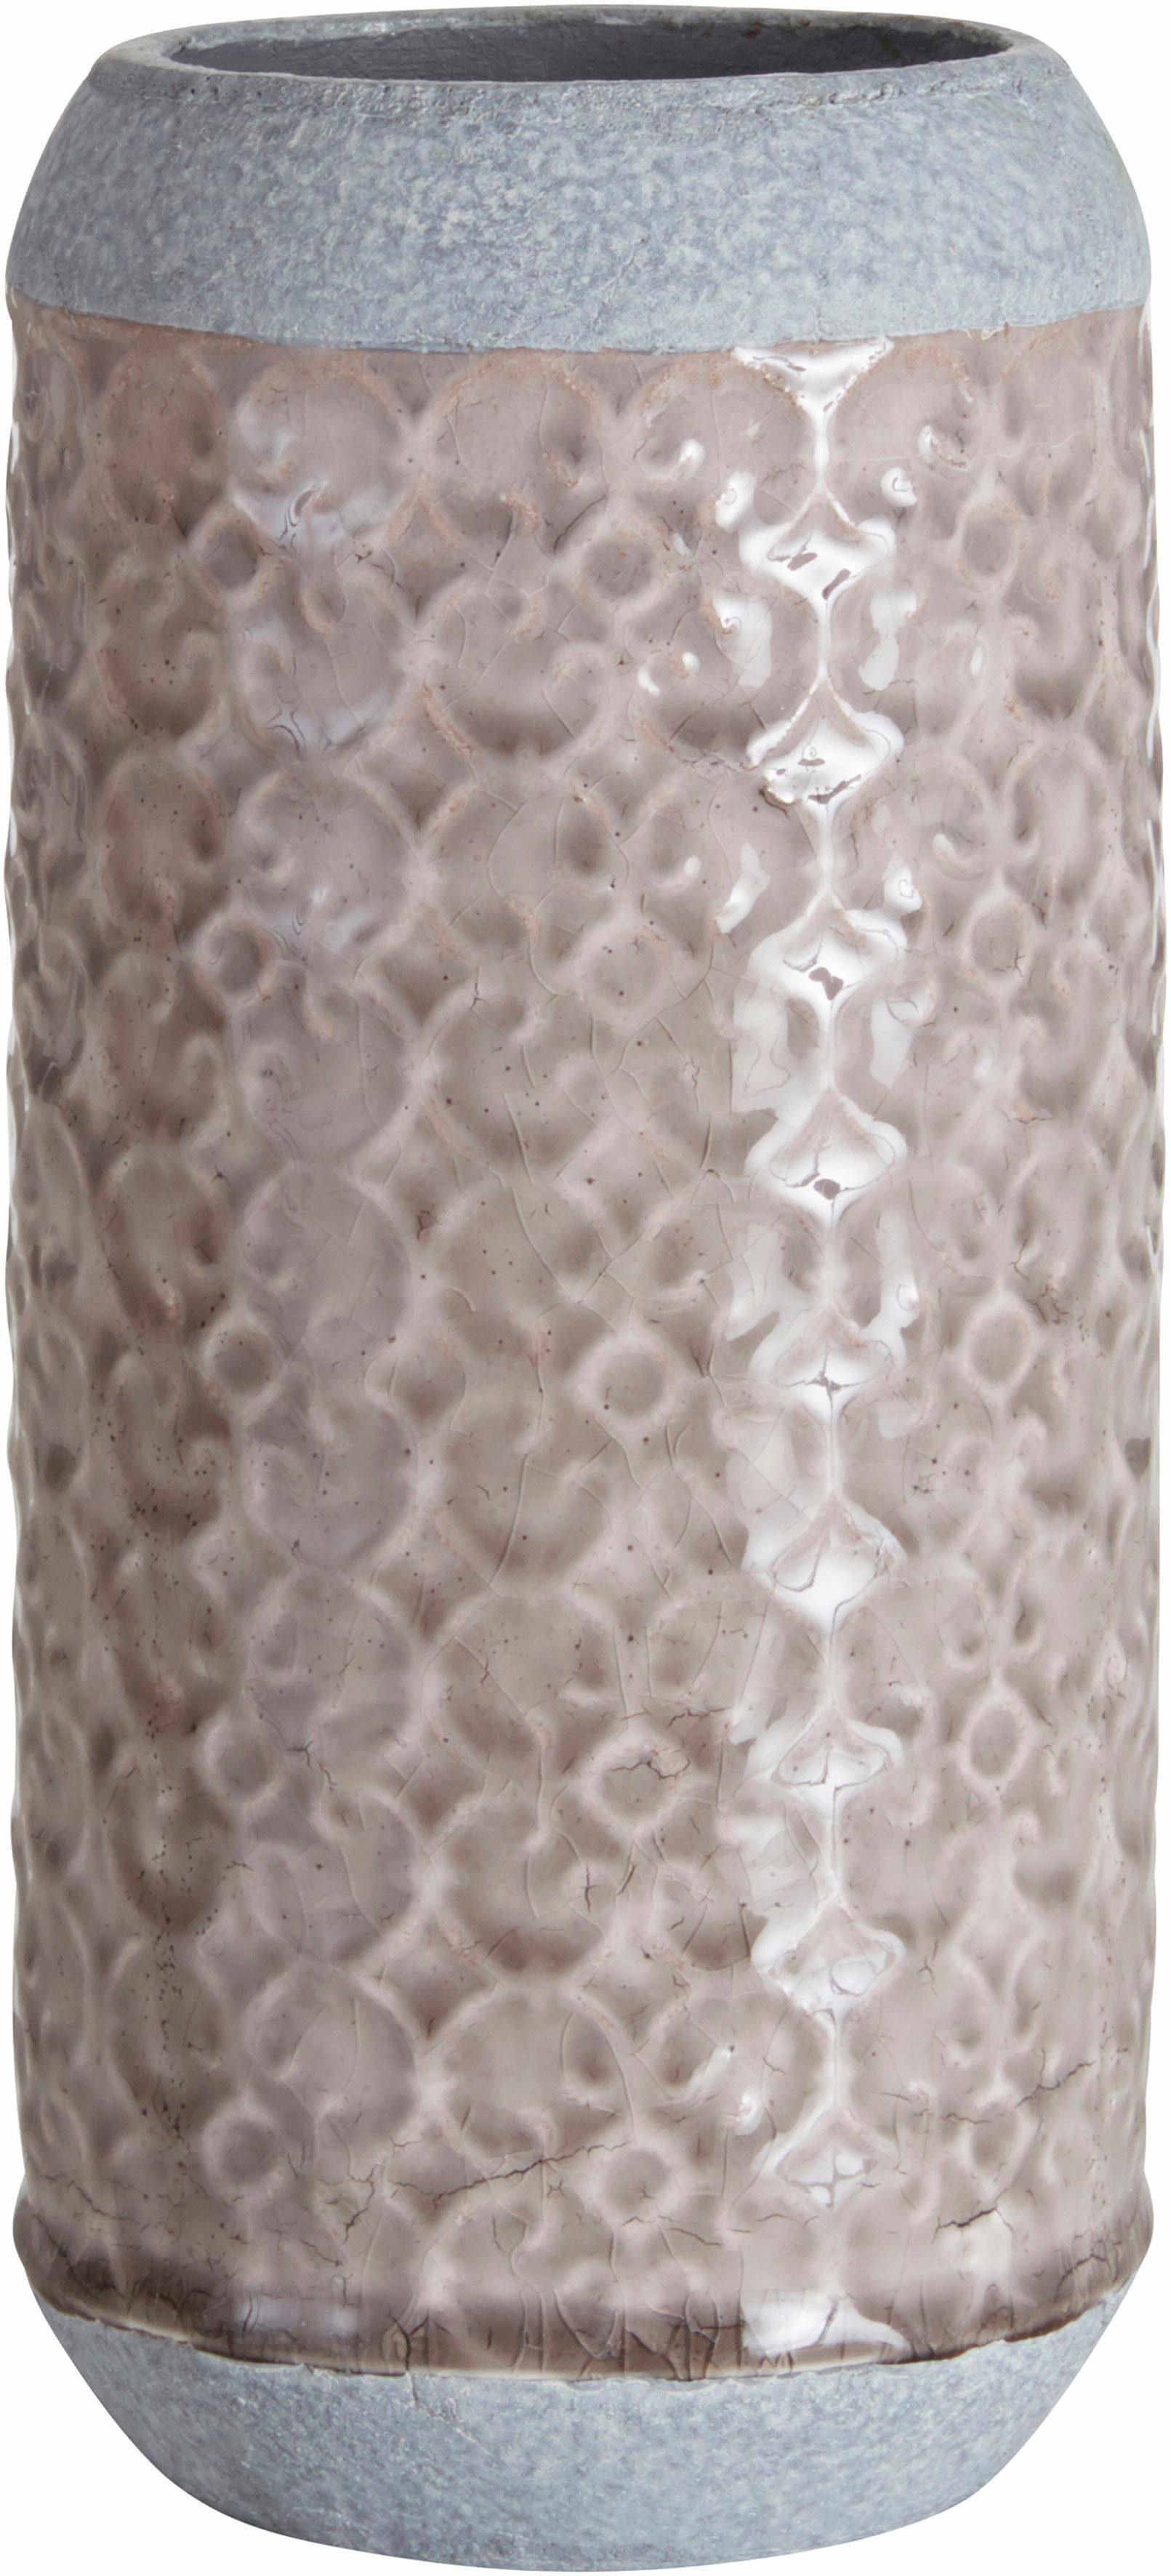 Home affaire Vase im Zement Look